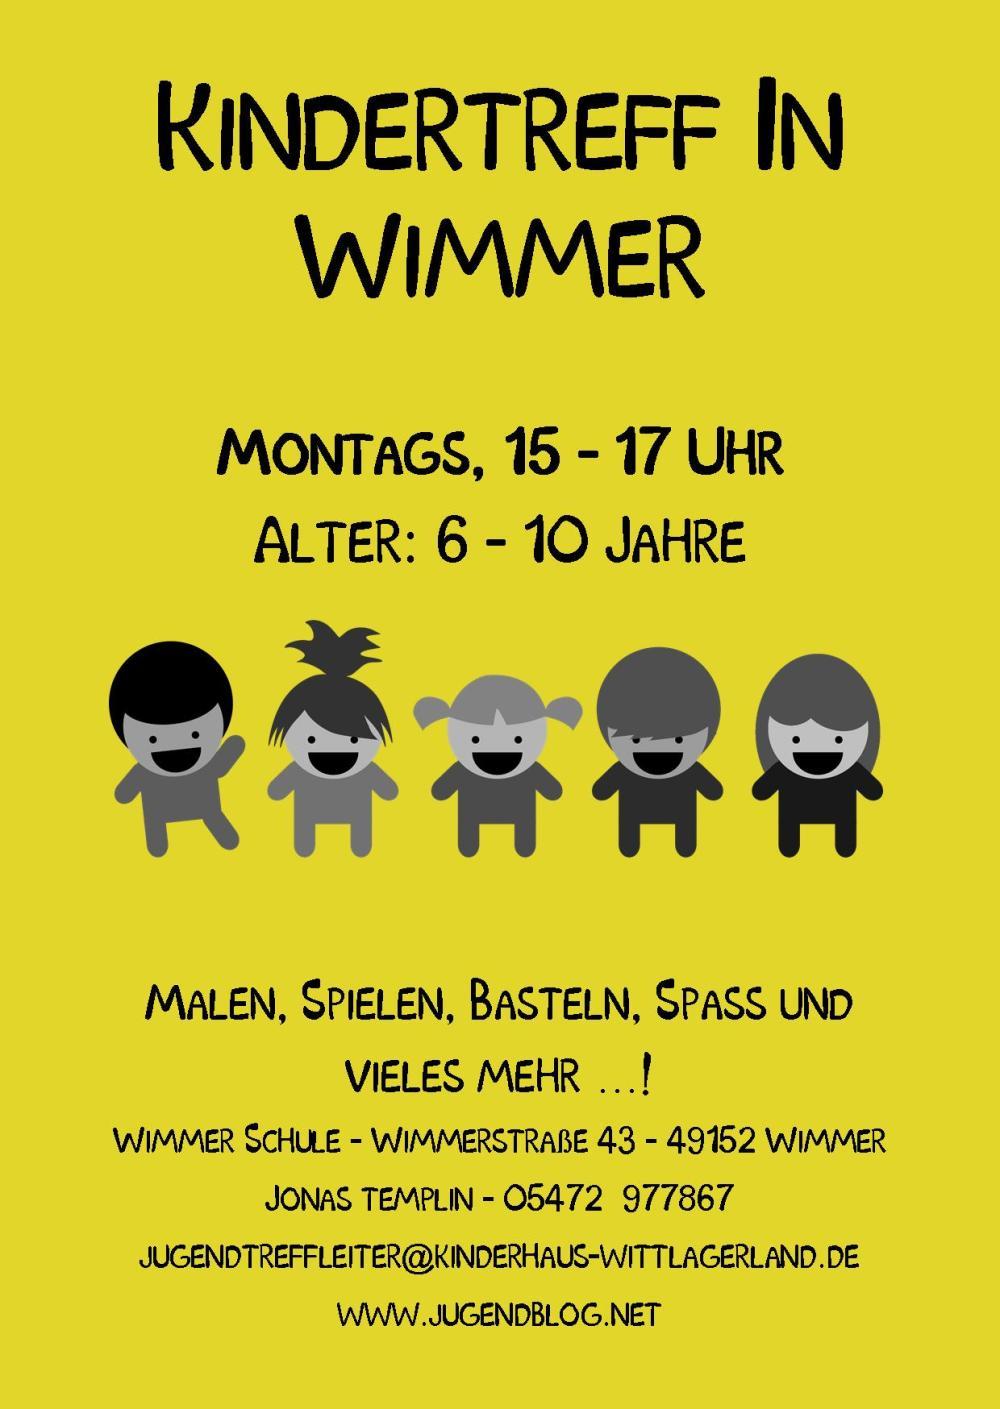 Kindertag Wimmer-Schule front Publisher 03.2015 Gelb